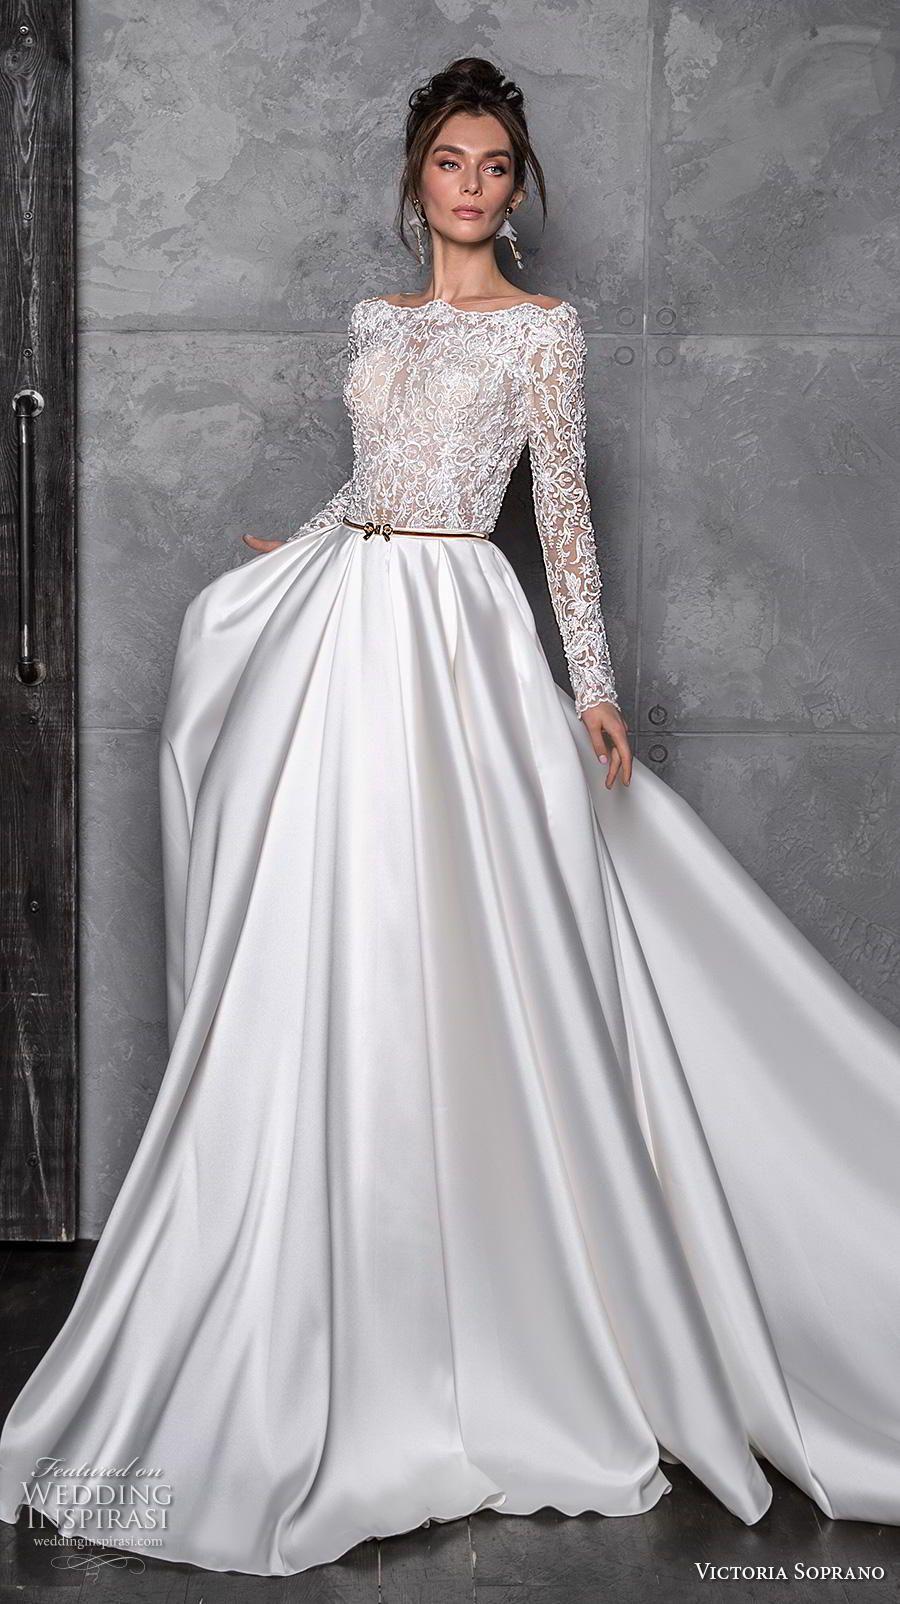 Victoria Soprano 2020 Wedding Dresses Chic Royal Bridal Collection Wedding Inspirasi Long Sleeve Wedding Dress Backless Wedding Dress Long Sleeve White Long Sleeve Wedding Dress